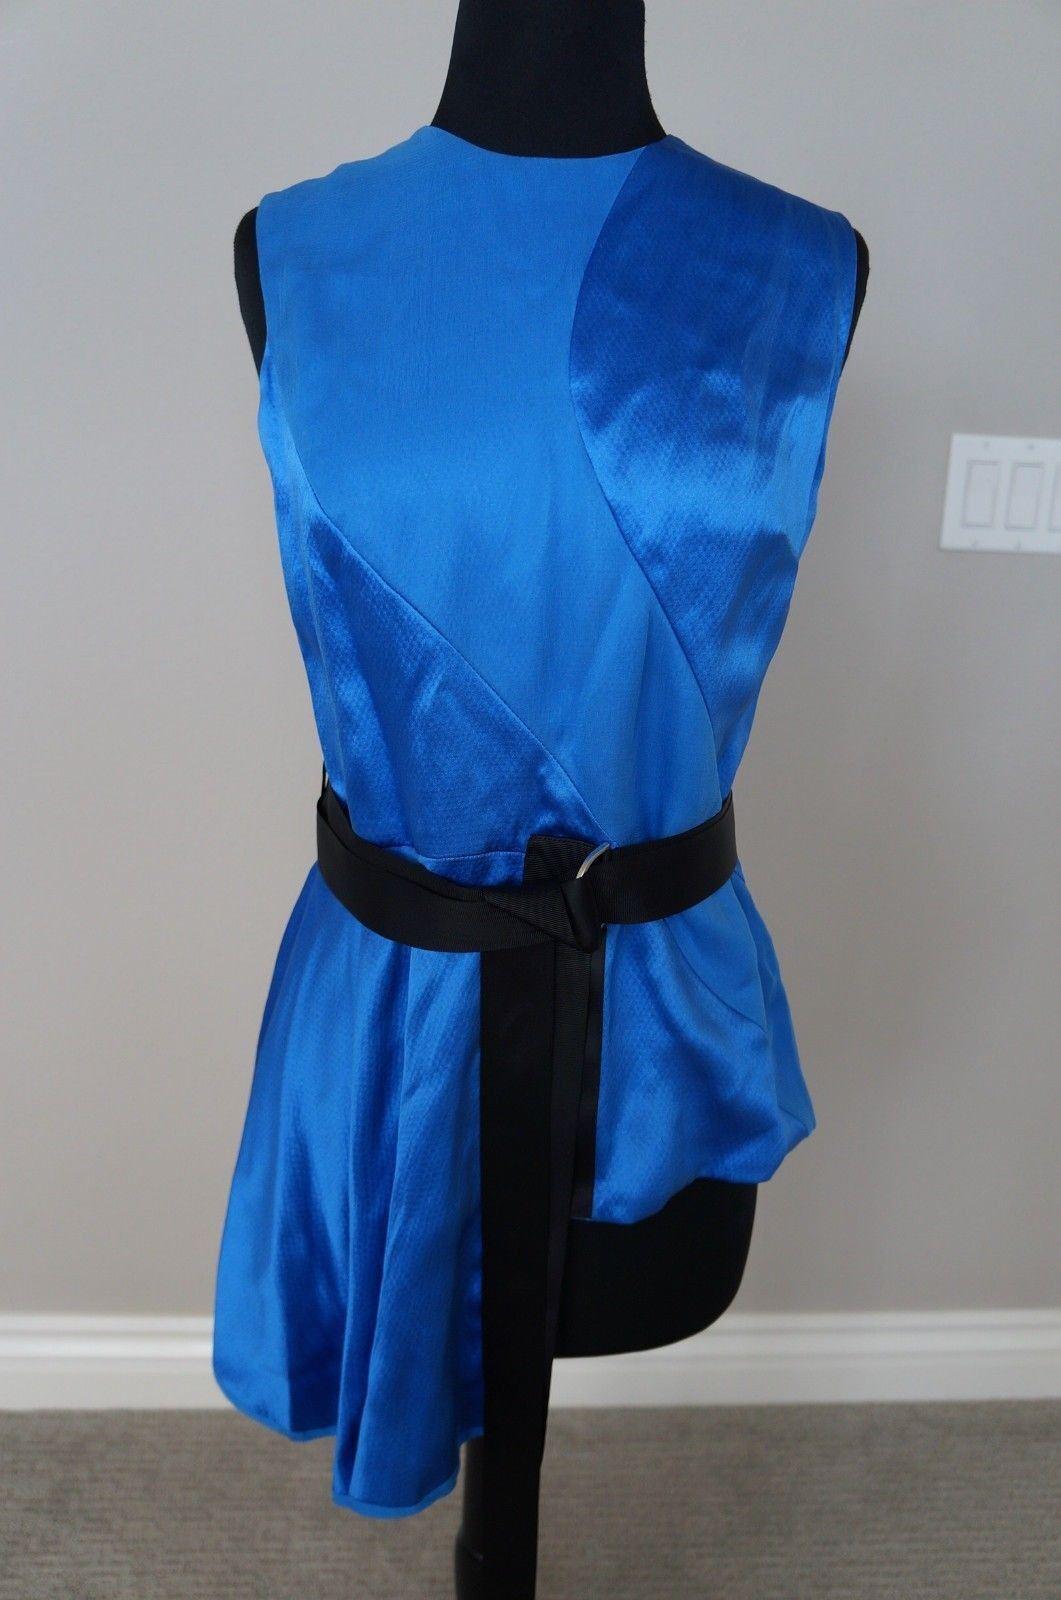 NEW ILJA Couture bluee Satin Asymmetrical Peplum Top Blouse Shirt S 4 UNIQUE